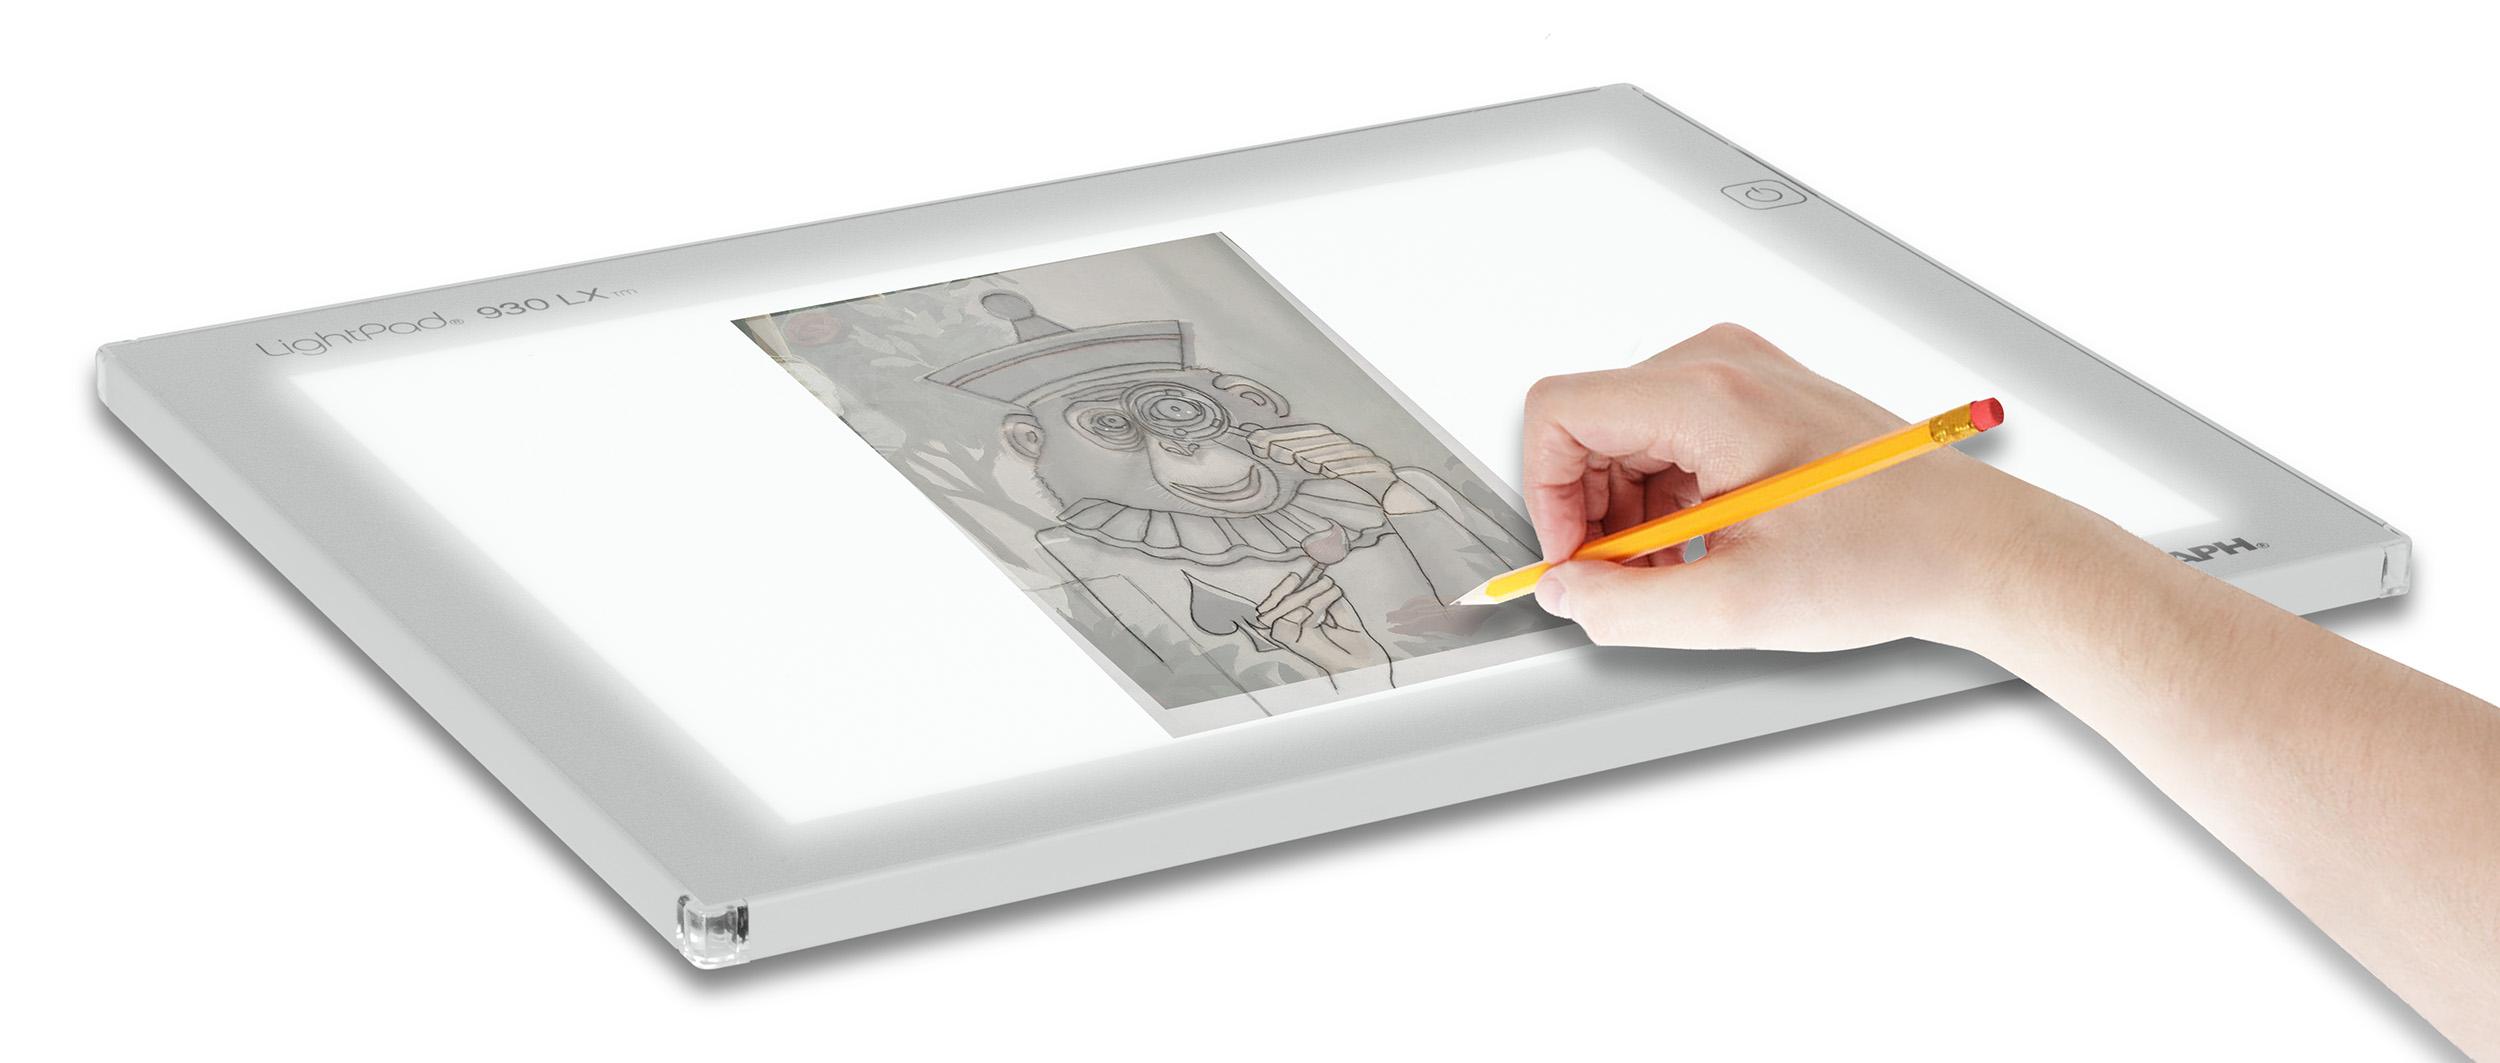 25930-LightPad-930-LX-props2